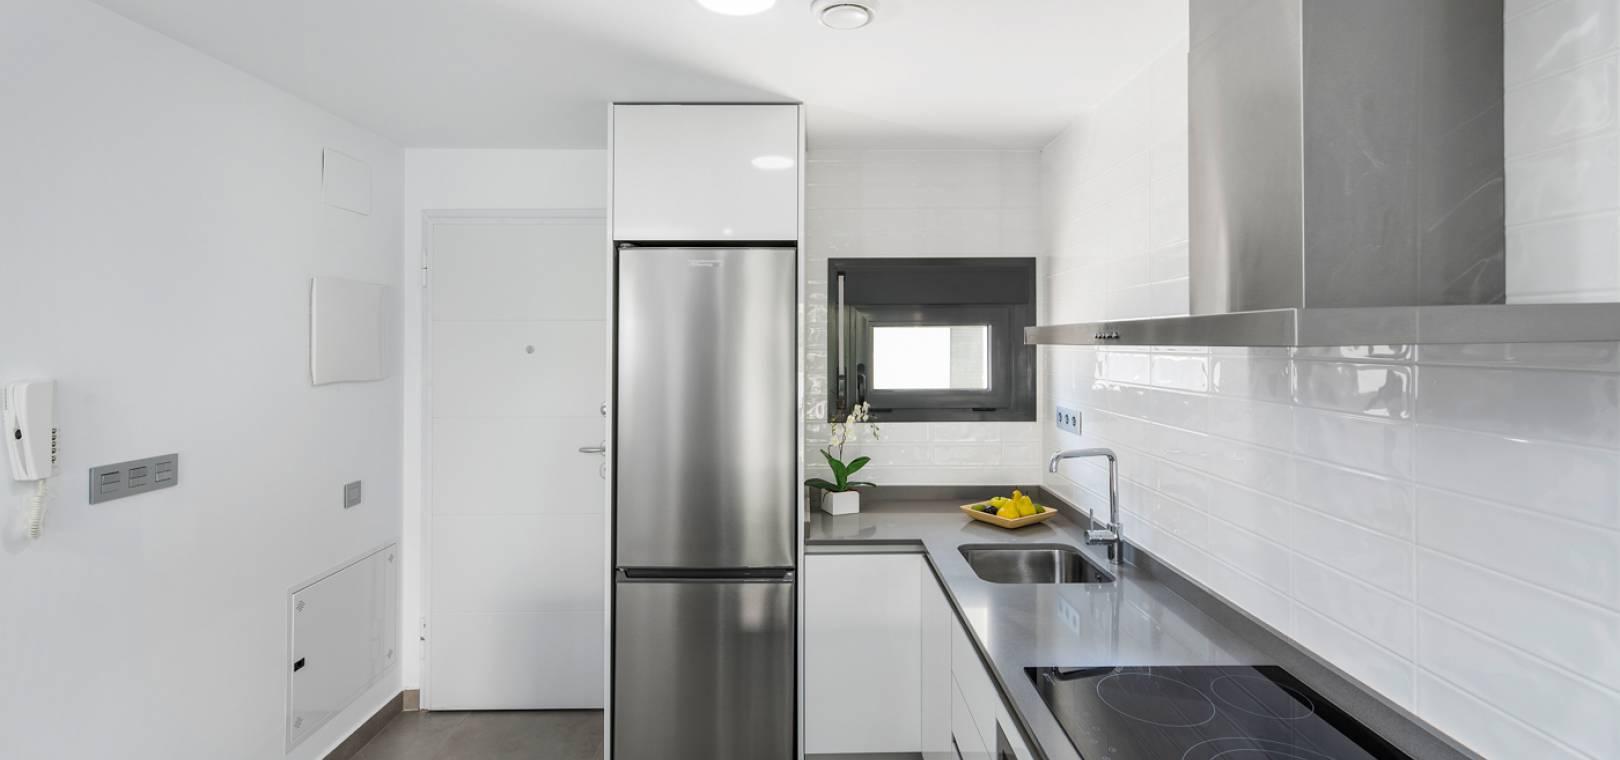 Neubau - Wohnung - Pilar de la Horadada